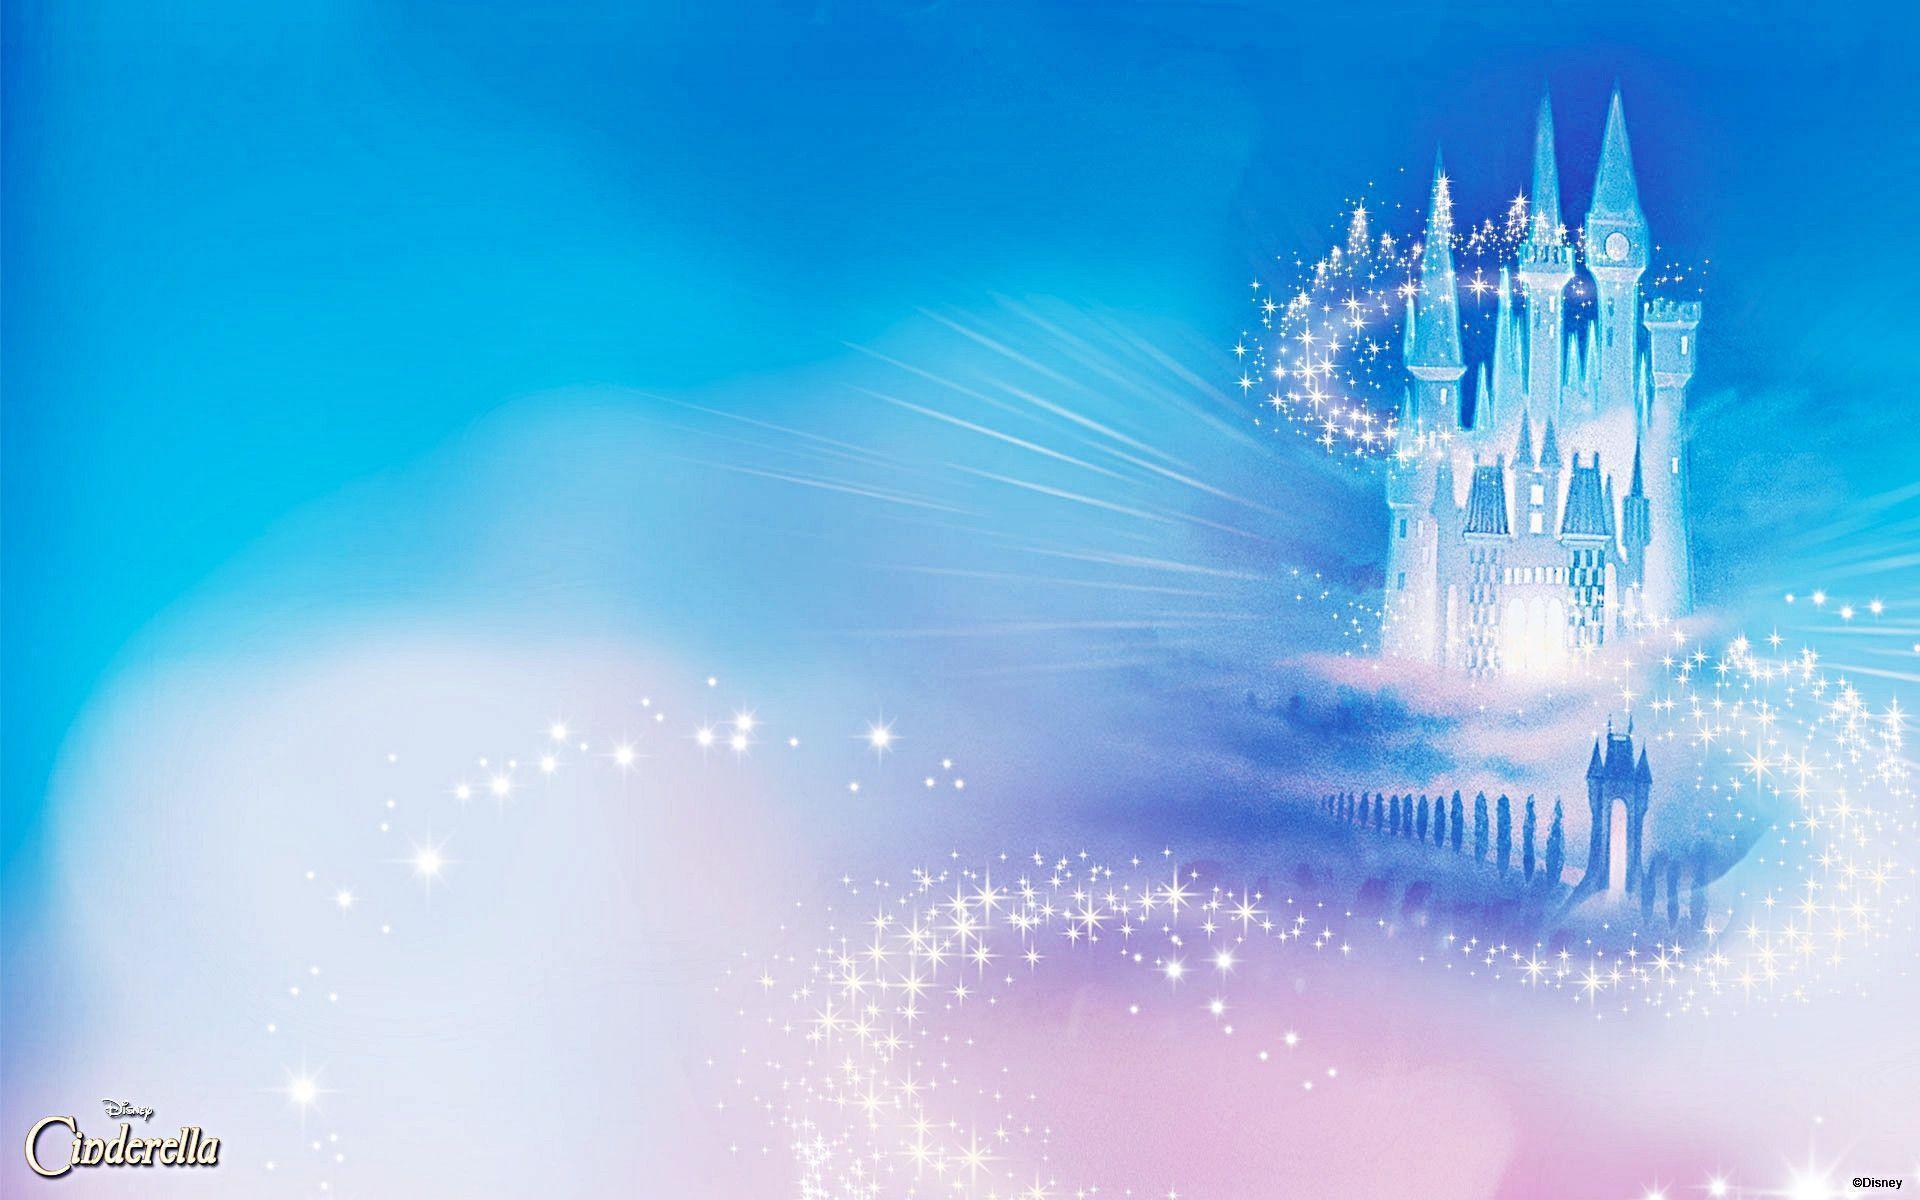 Disney Cinderella Wallpapers Wallpaper Cave